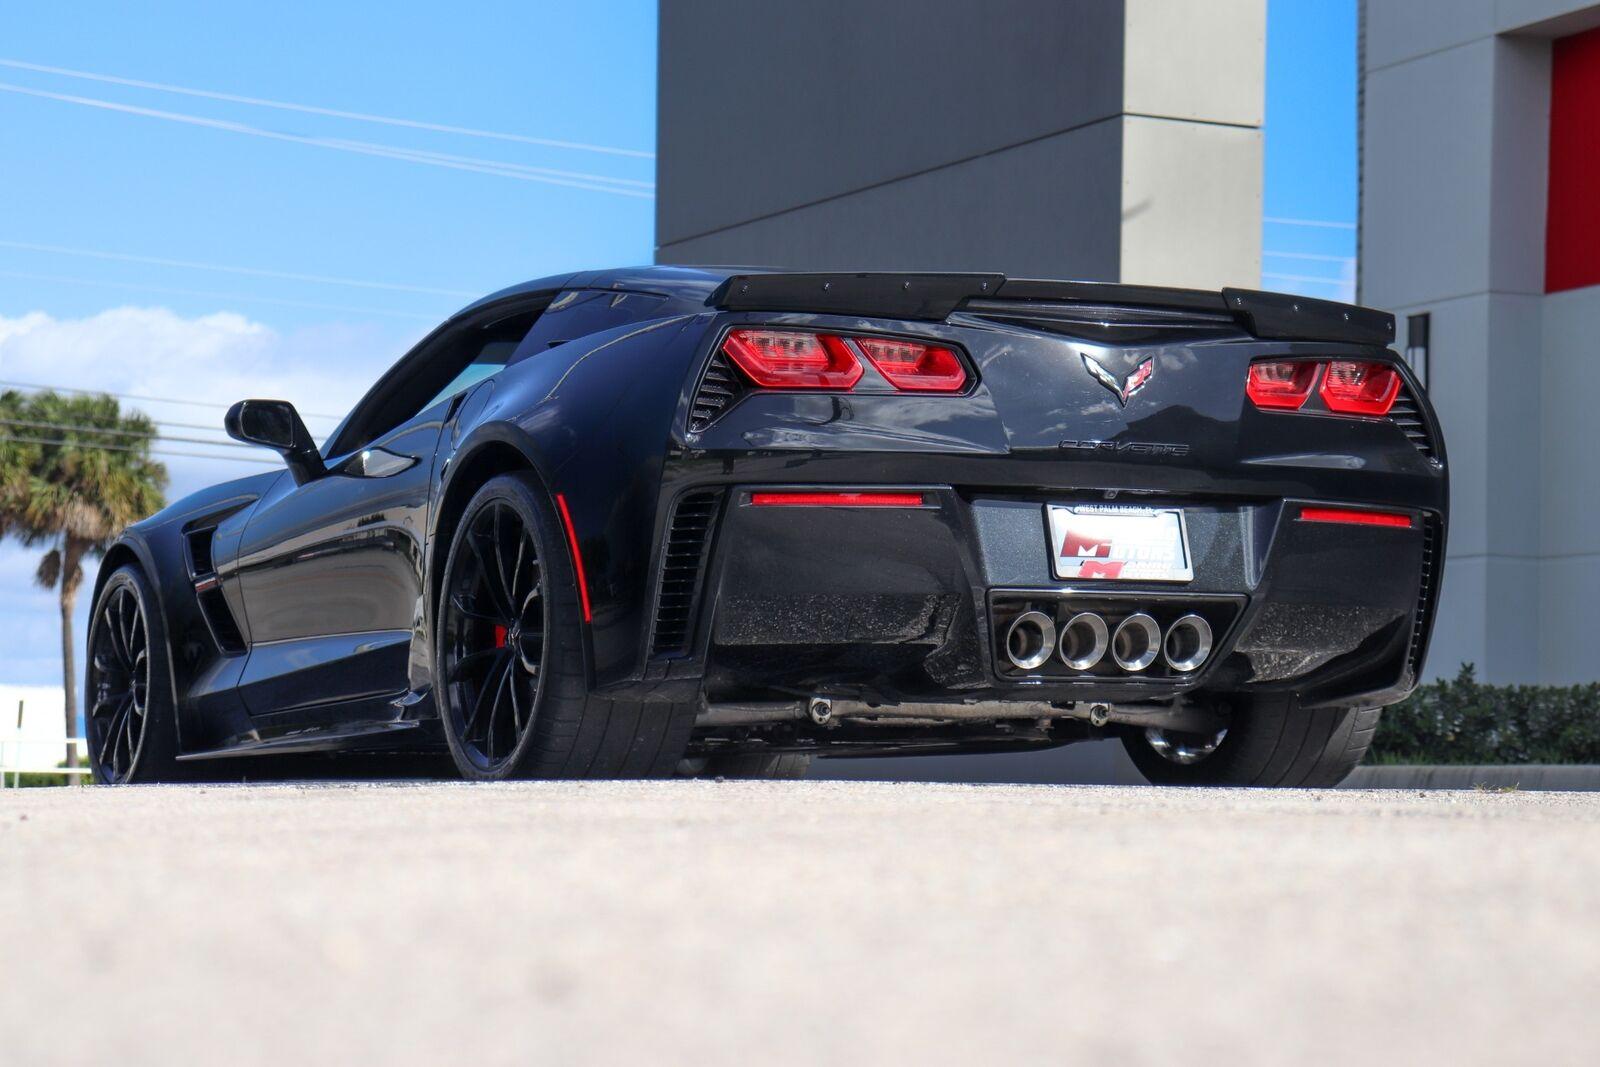 2018 Black Chevrolet Corvette Grand Sport    C7 Corvette Photo 6